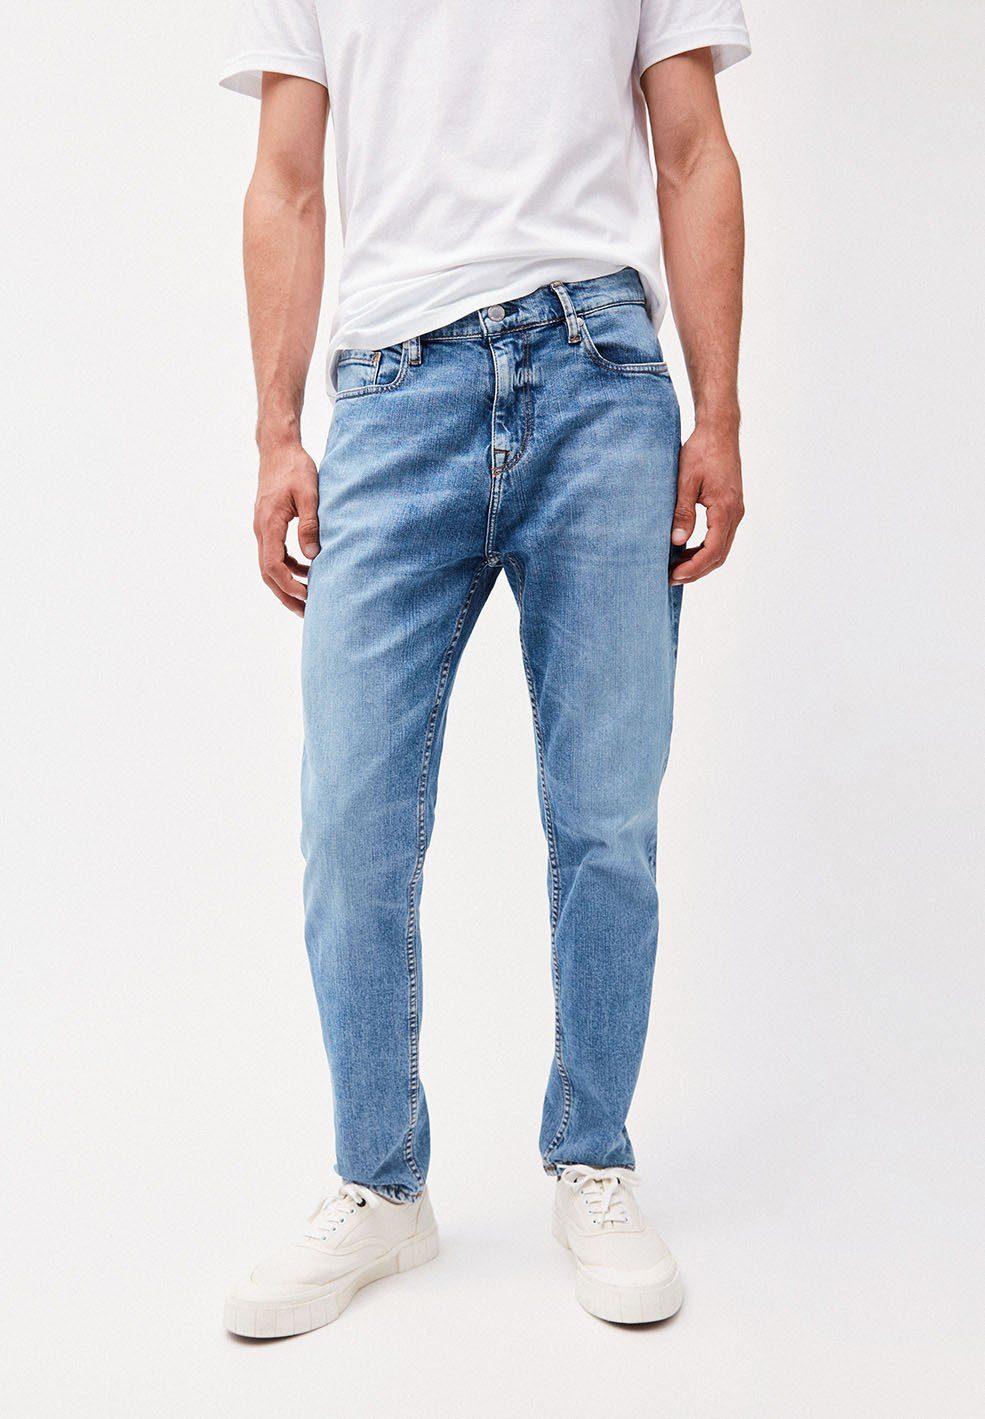 Armedangels 5 Pocket Jeans »AARO Herren Tapered Fit Mid Waist« GOTS, organic, CERES 08 online kaufen | OTTO